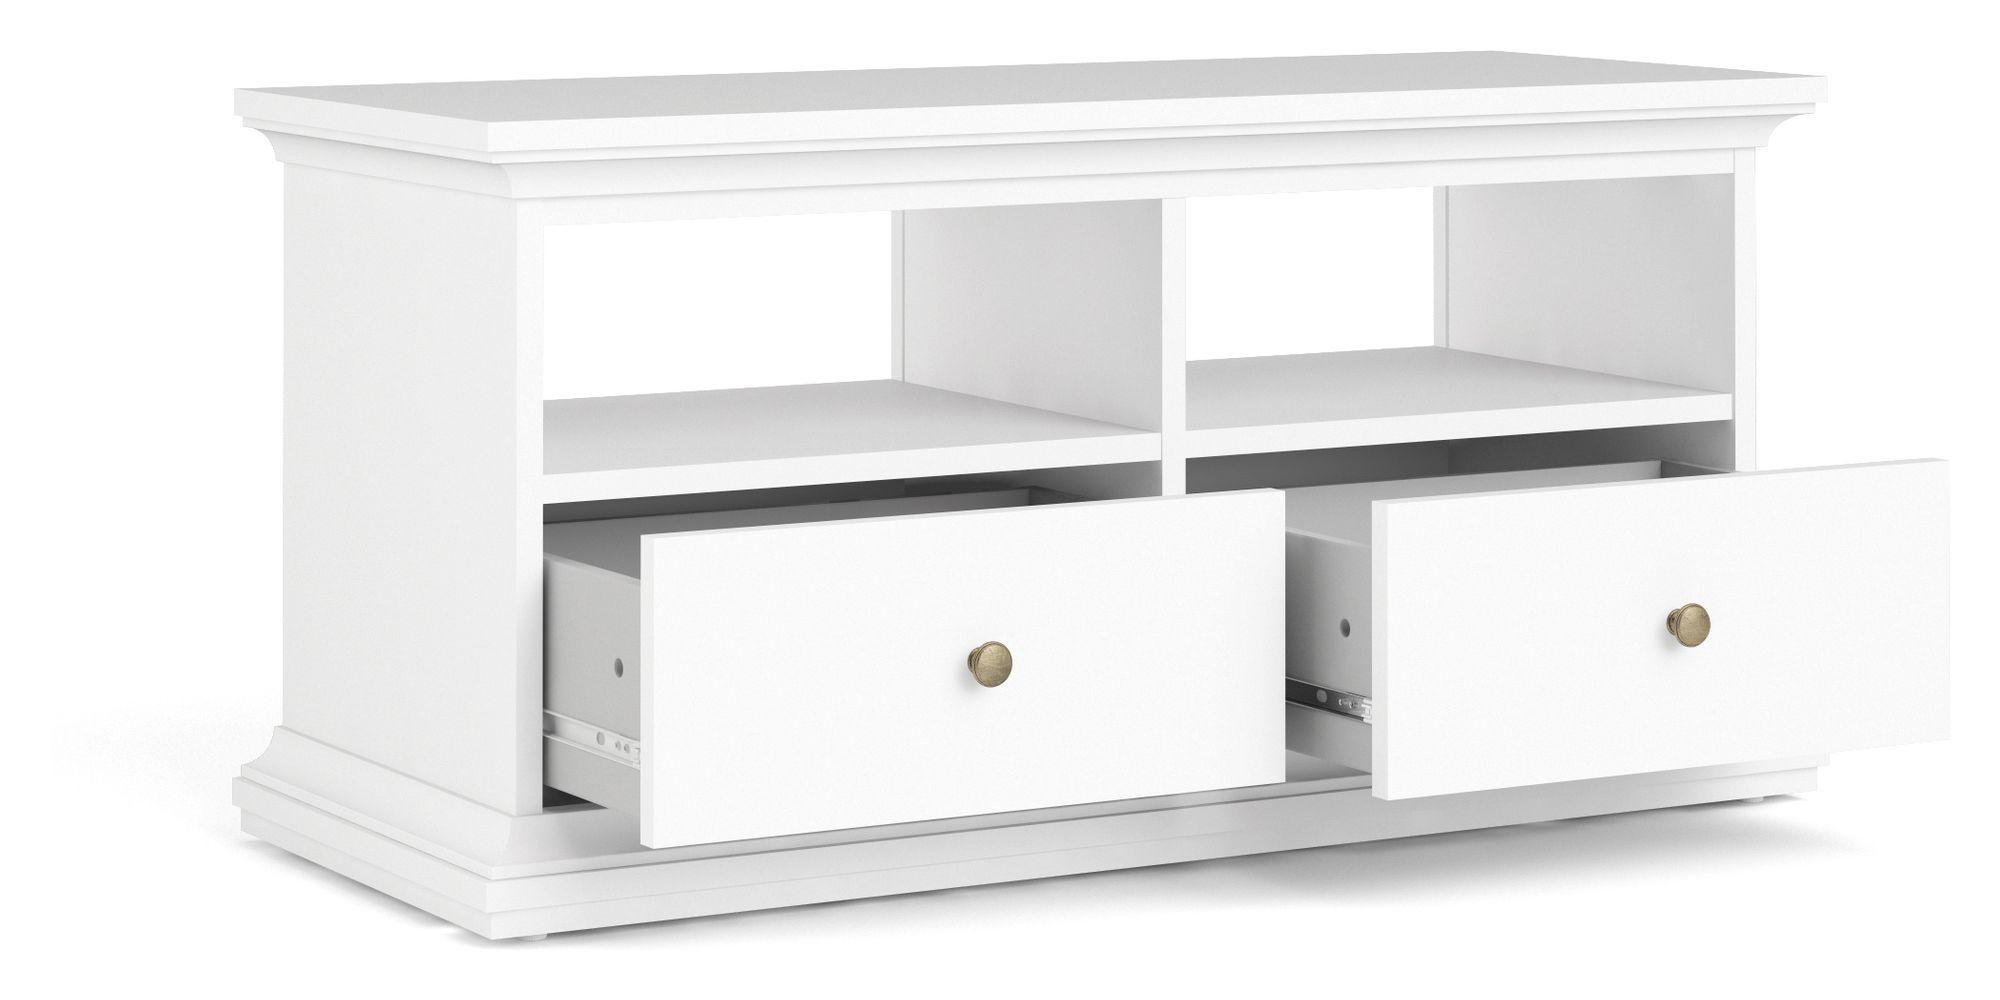 Paris Tvbord - Hvid m/2 skuffer - Enkelt hvidt TV-møbel